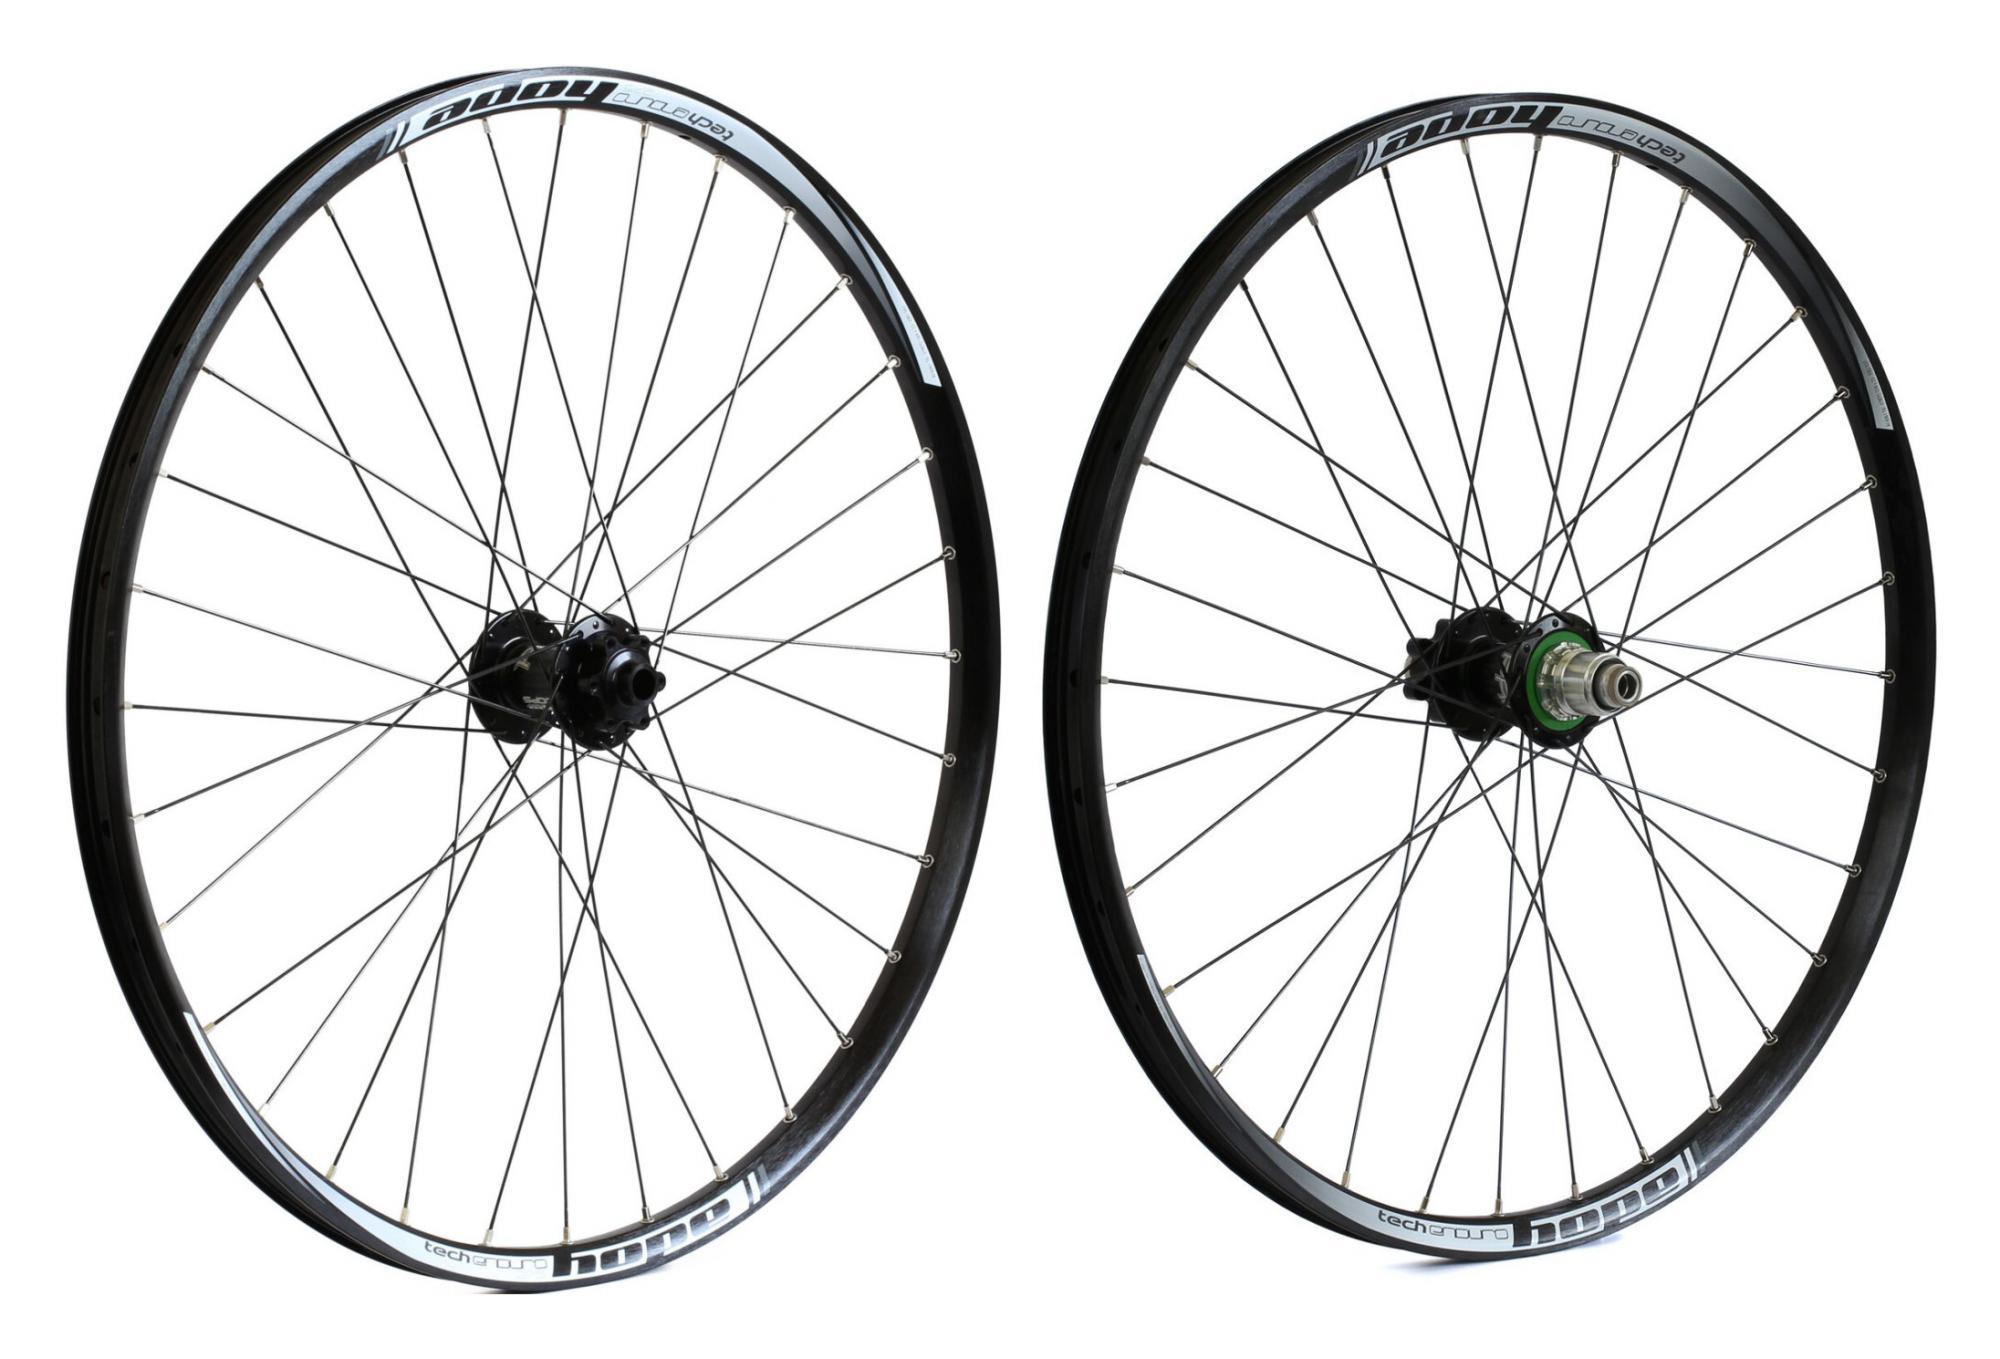 Contact 1:8 roue 5 rayons-Look Avant # 32 Shore